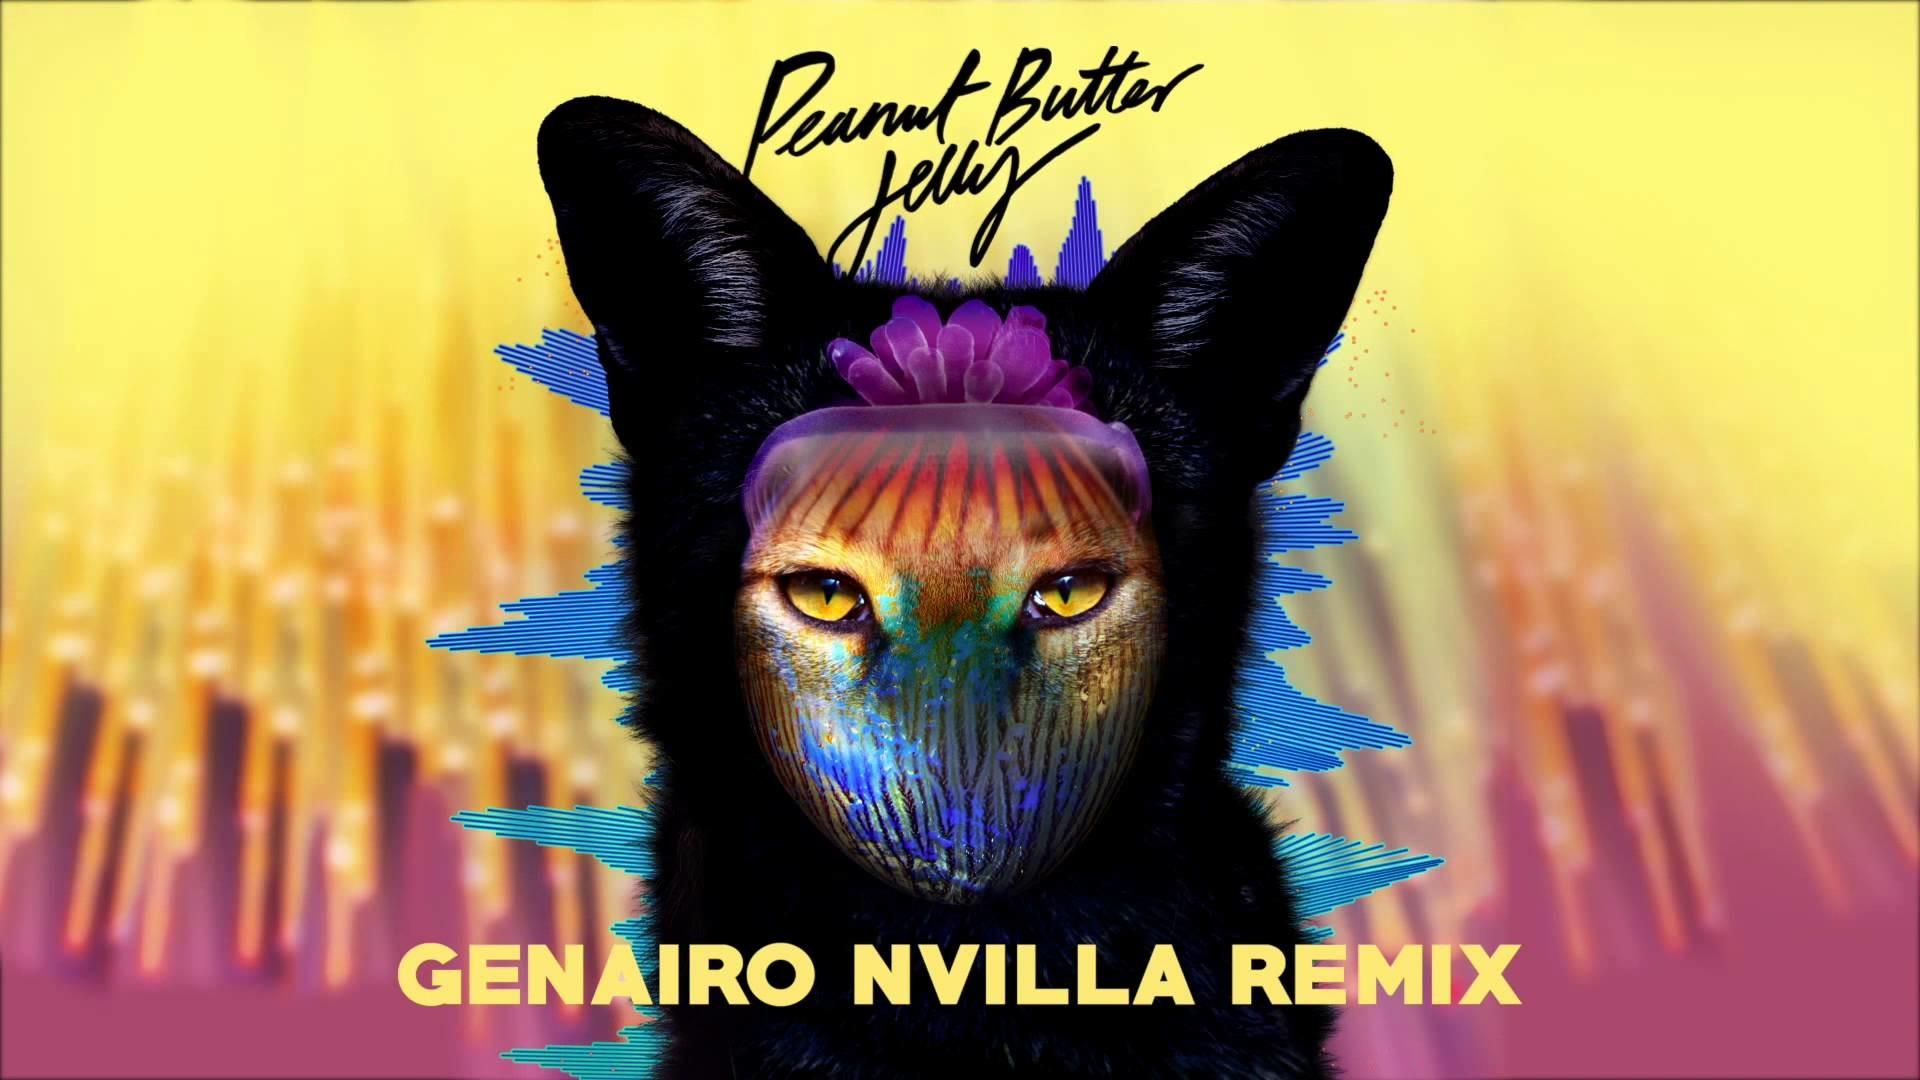 Galantis – Peanut Butter Jelly (Genairo Nvilla remix)